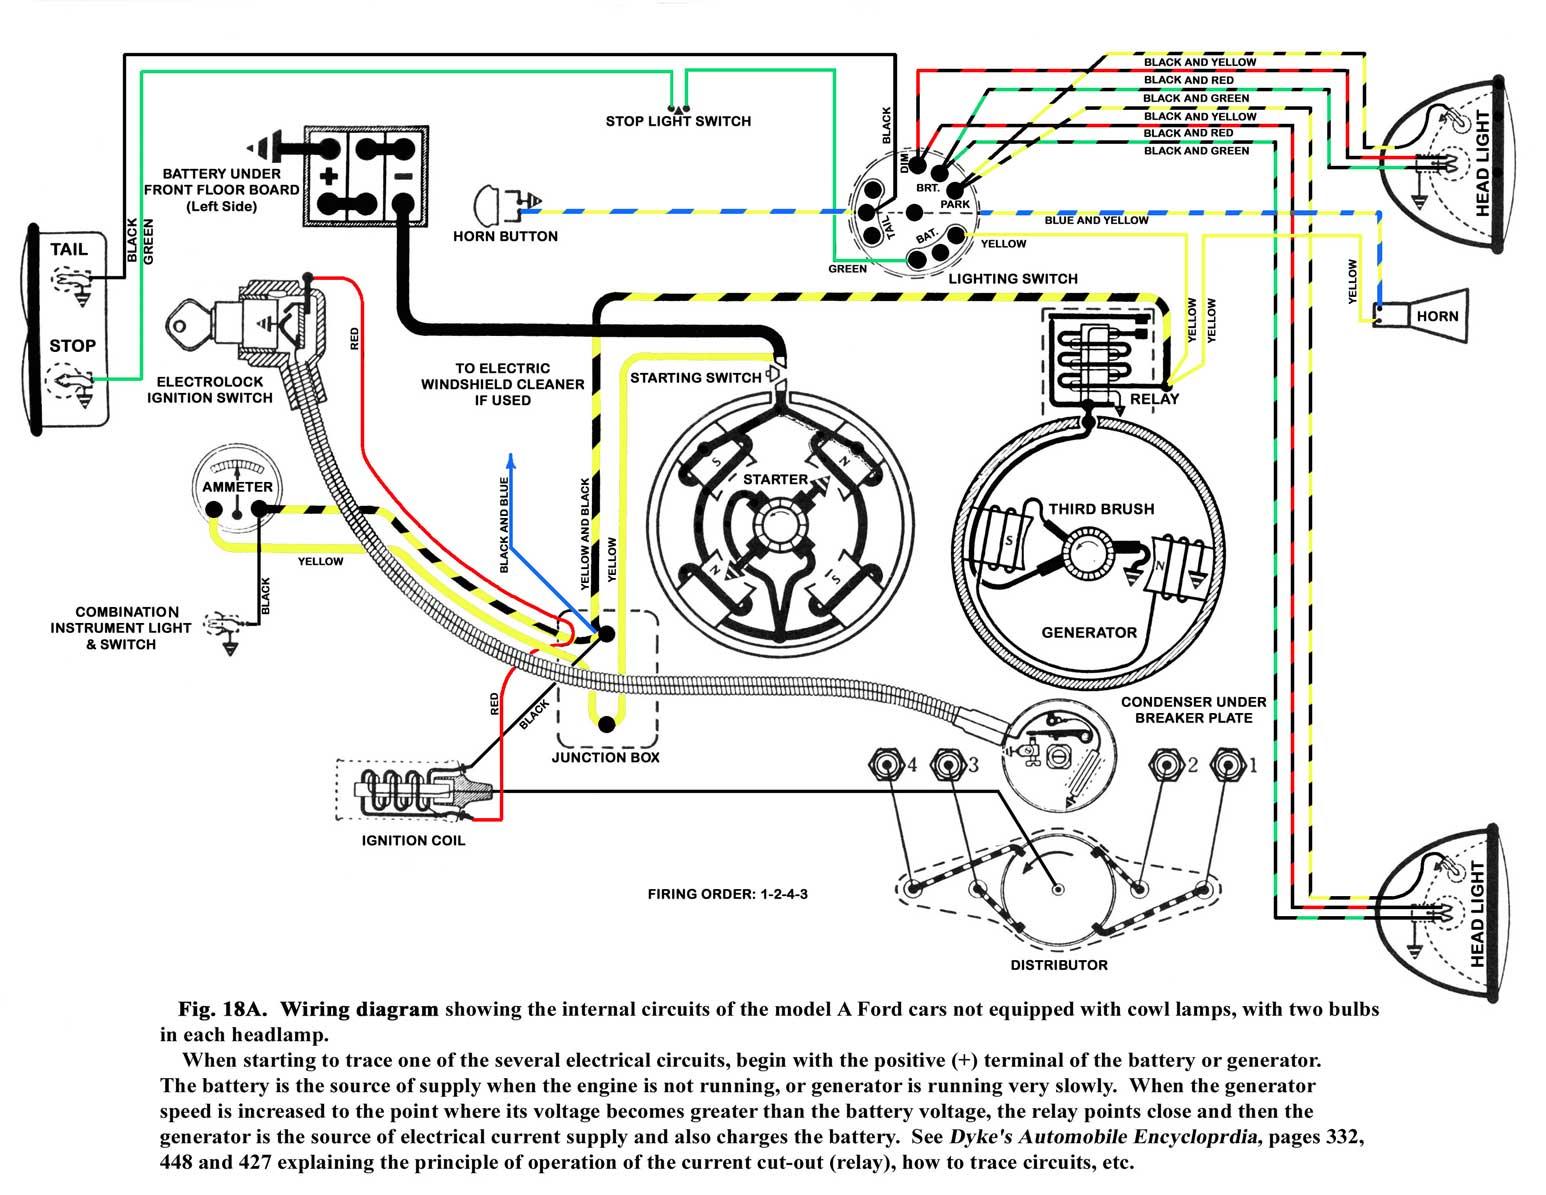 Pleasant John Deere 4020 Starter Wiring Diagram Basic Electronics Wiring Wiring Cloud Onicaalyptbenolwigegmohammedshrineorg